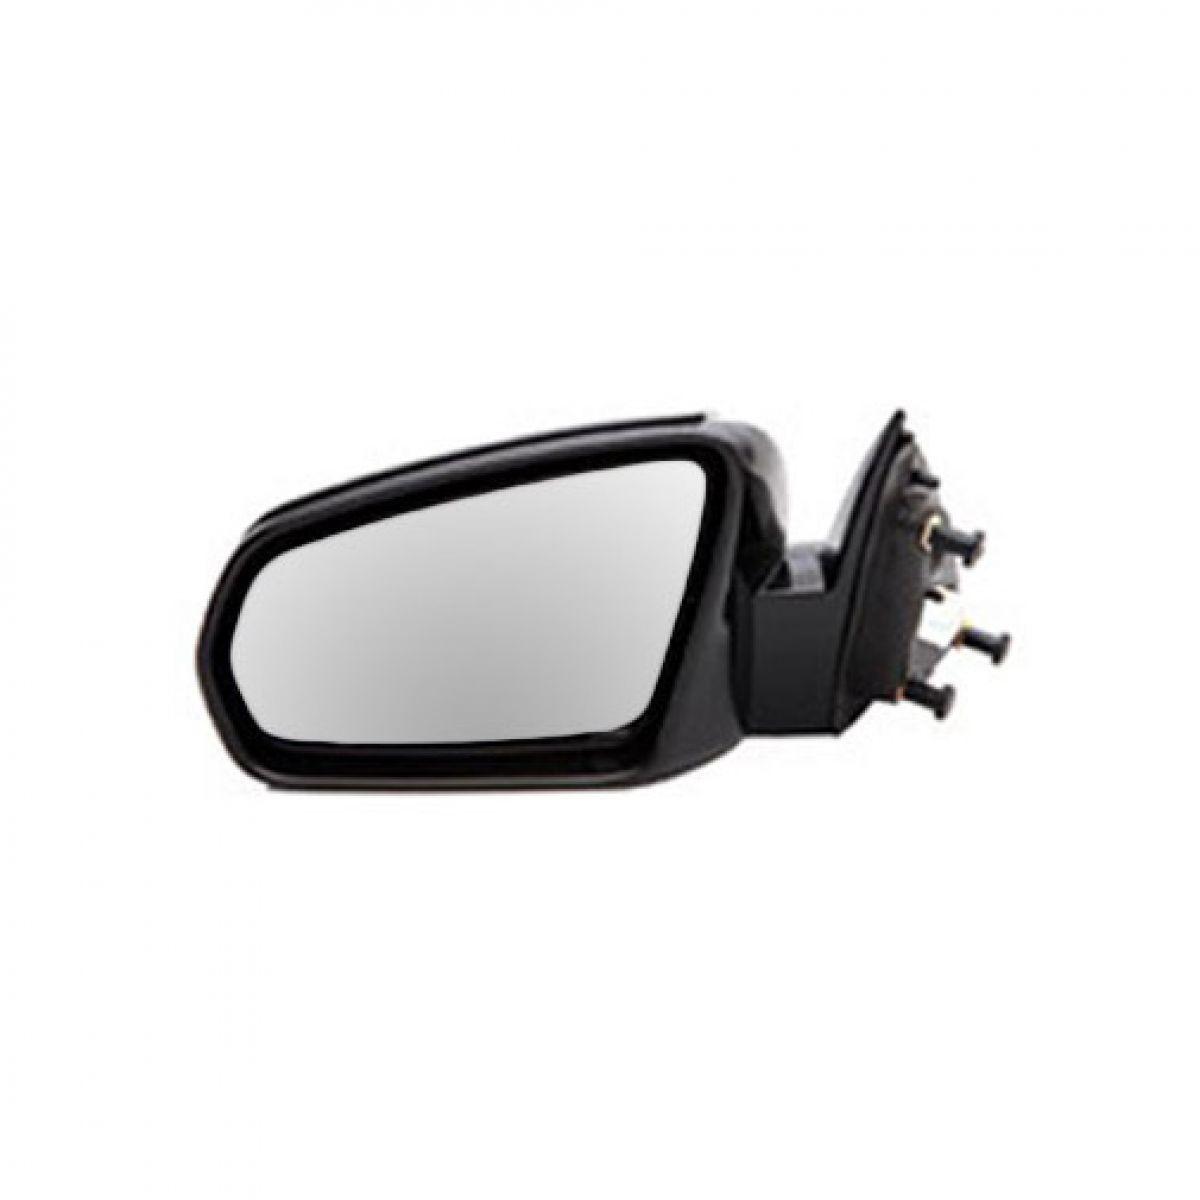 USミラー セブン - セブン7 - 10セブンのための新しい側面の見なさい鏡の力の固定された黒い運転者左のLH New Side View Mirror Power Fixed Black Driver Left LH for 07-10 Sebring Sedan